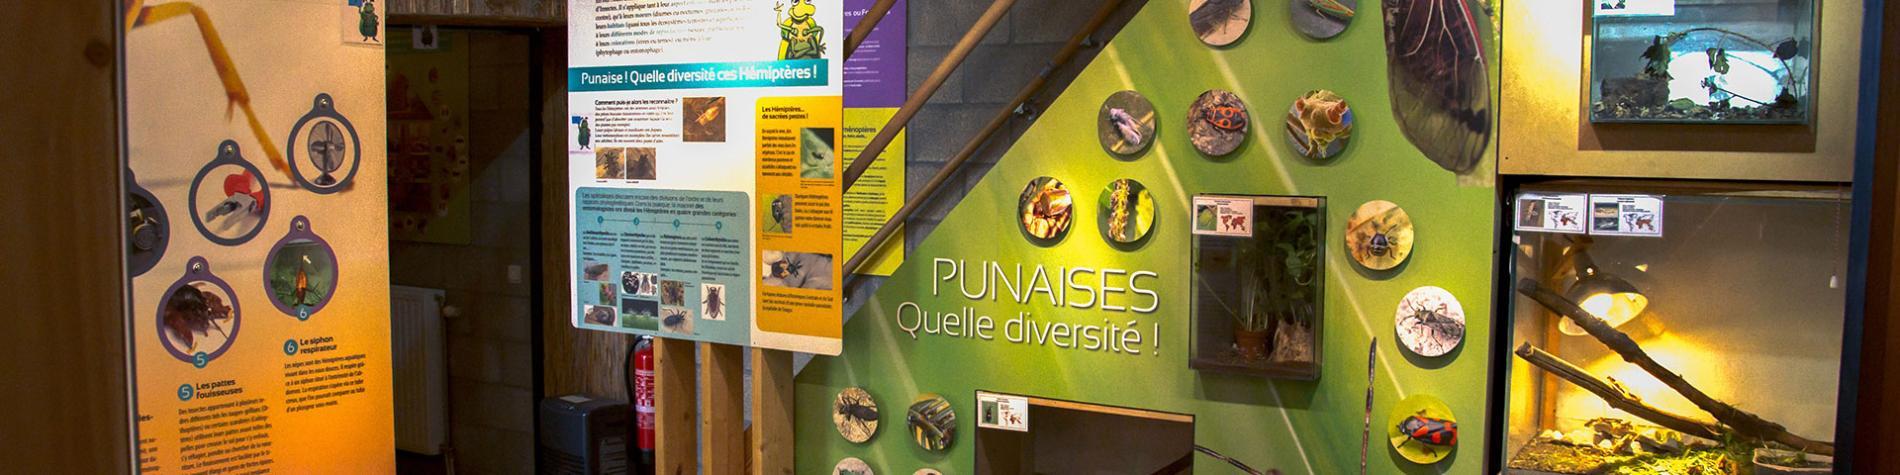 Hexapoda - Insectarium - Jean Leclercq - musée